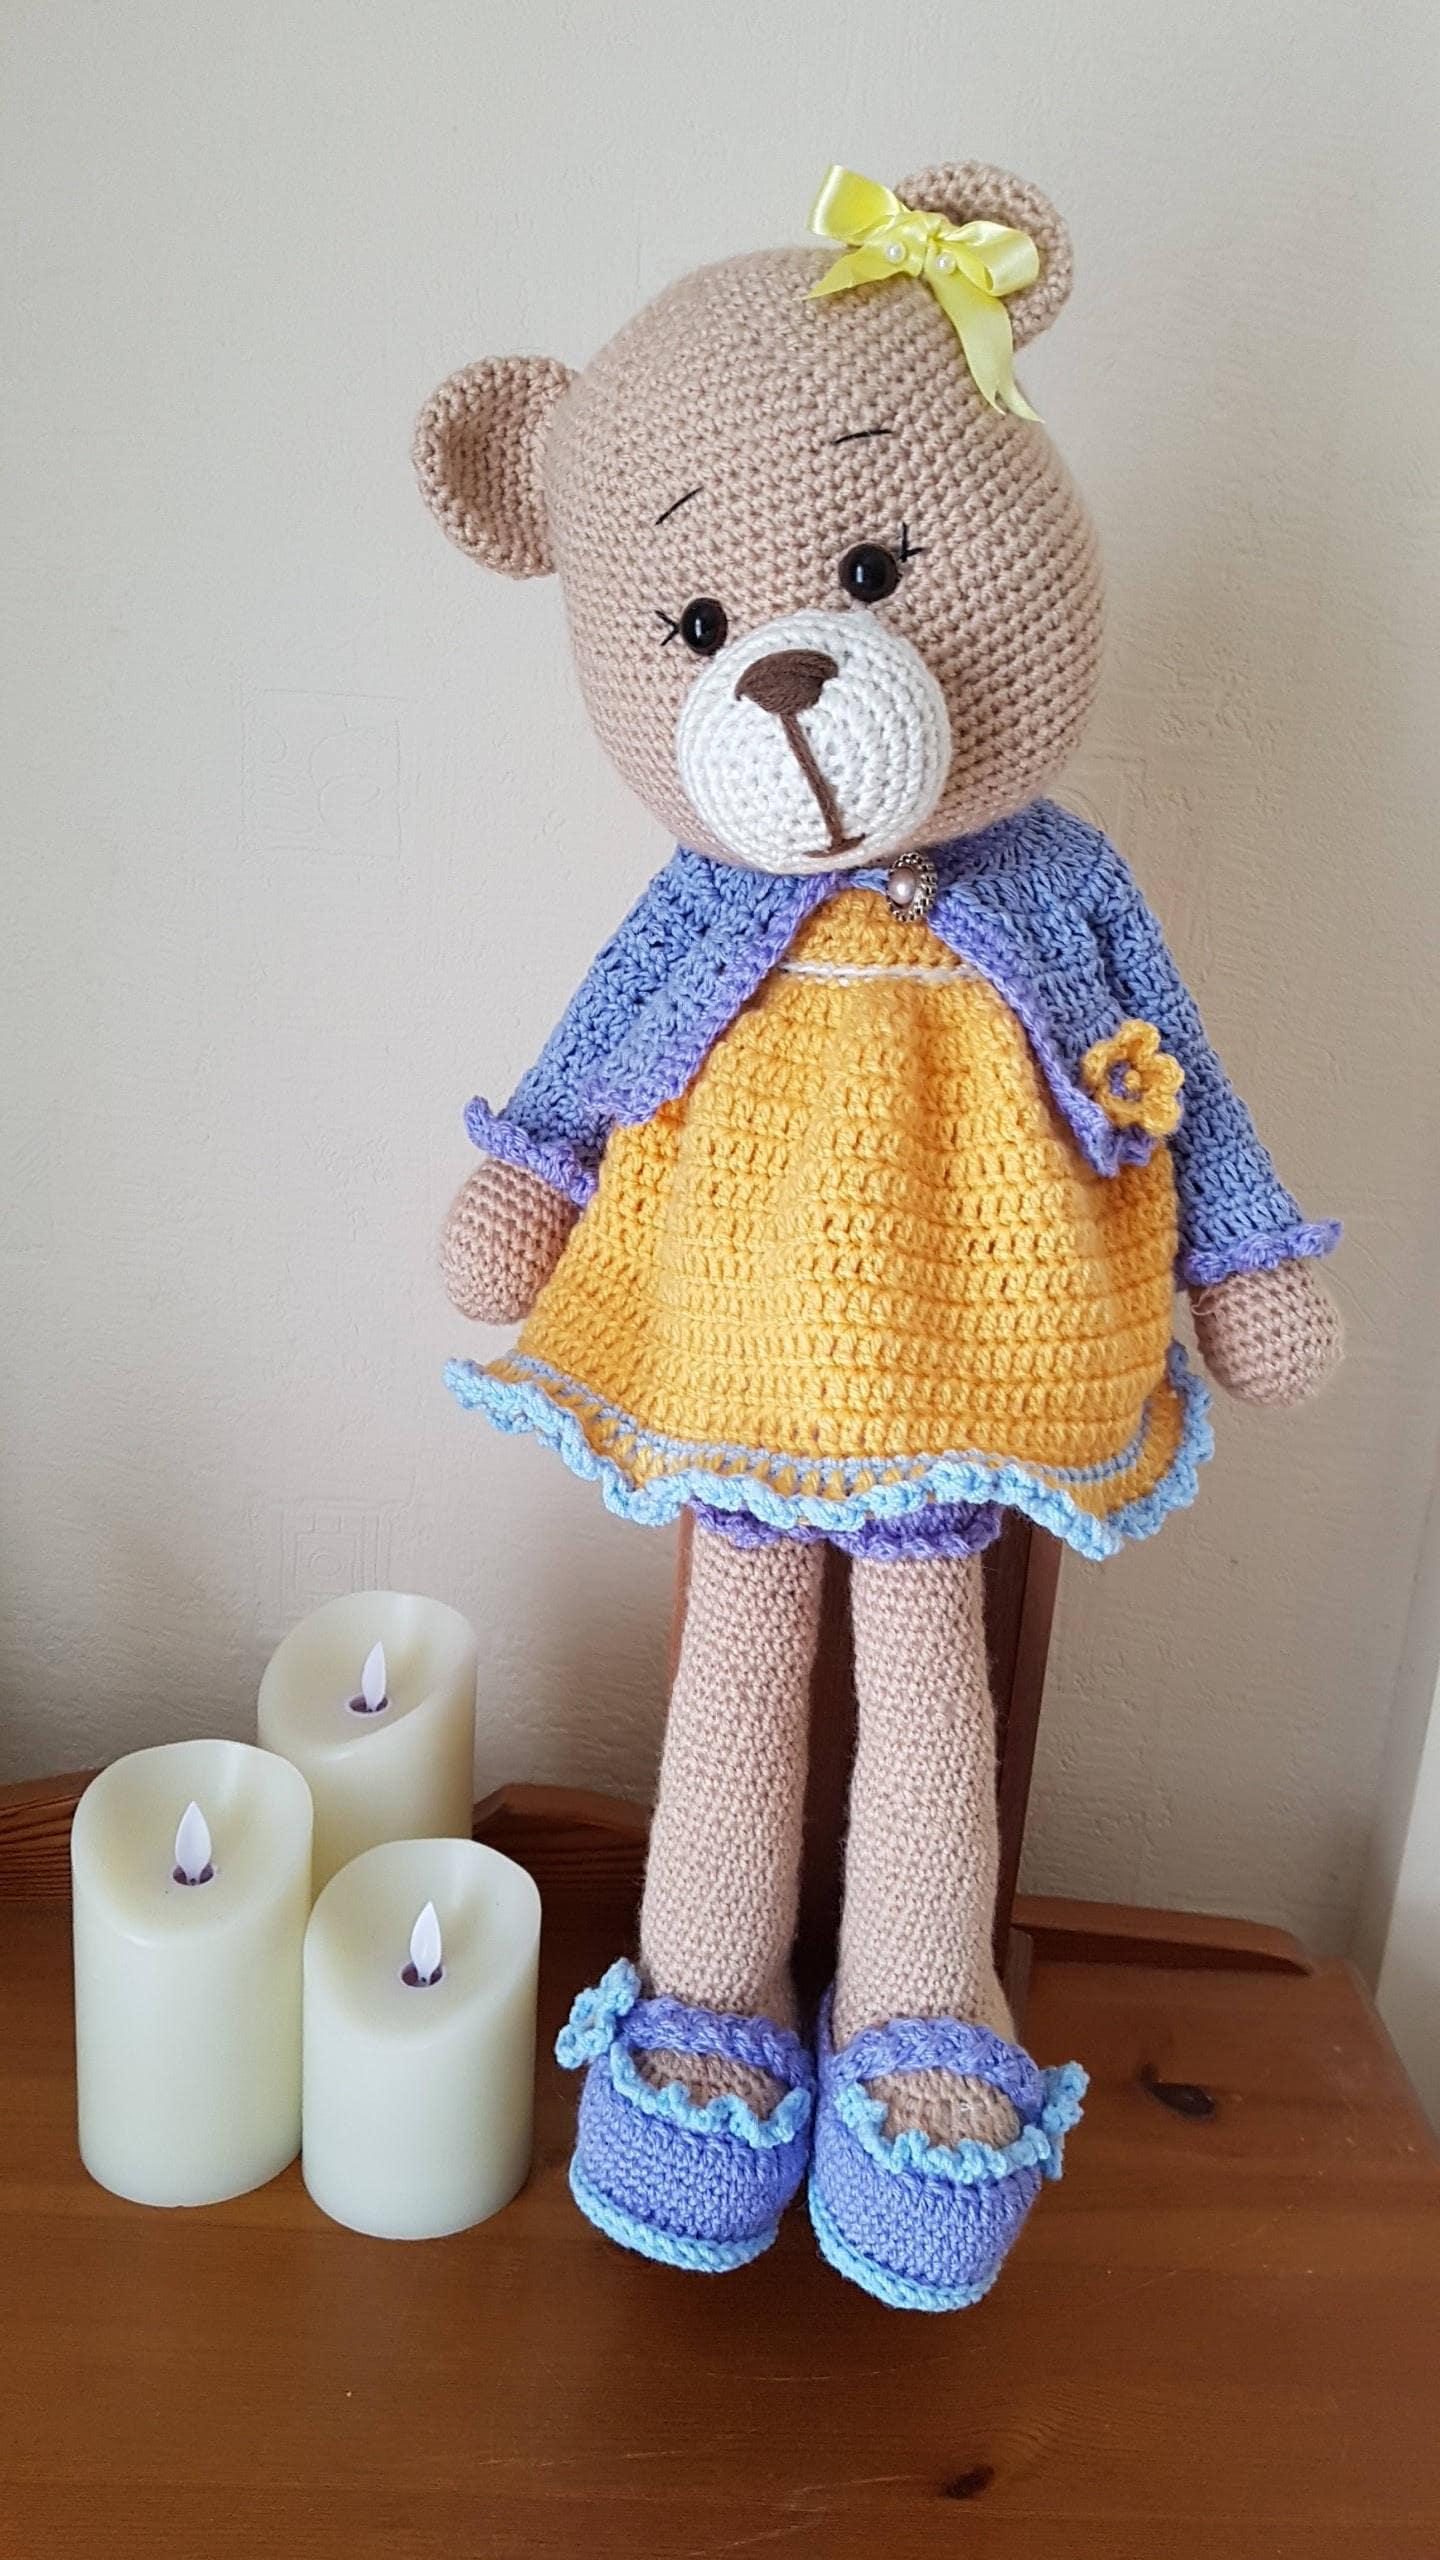 Hand crochet soft toy Teddy